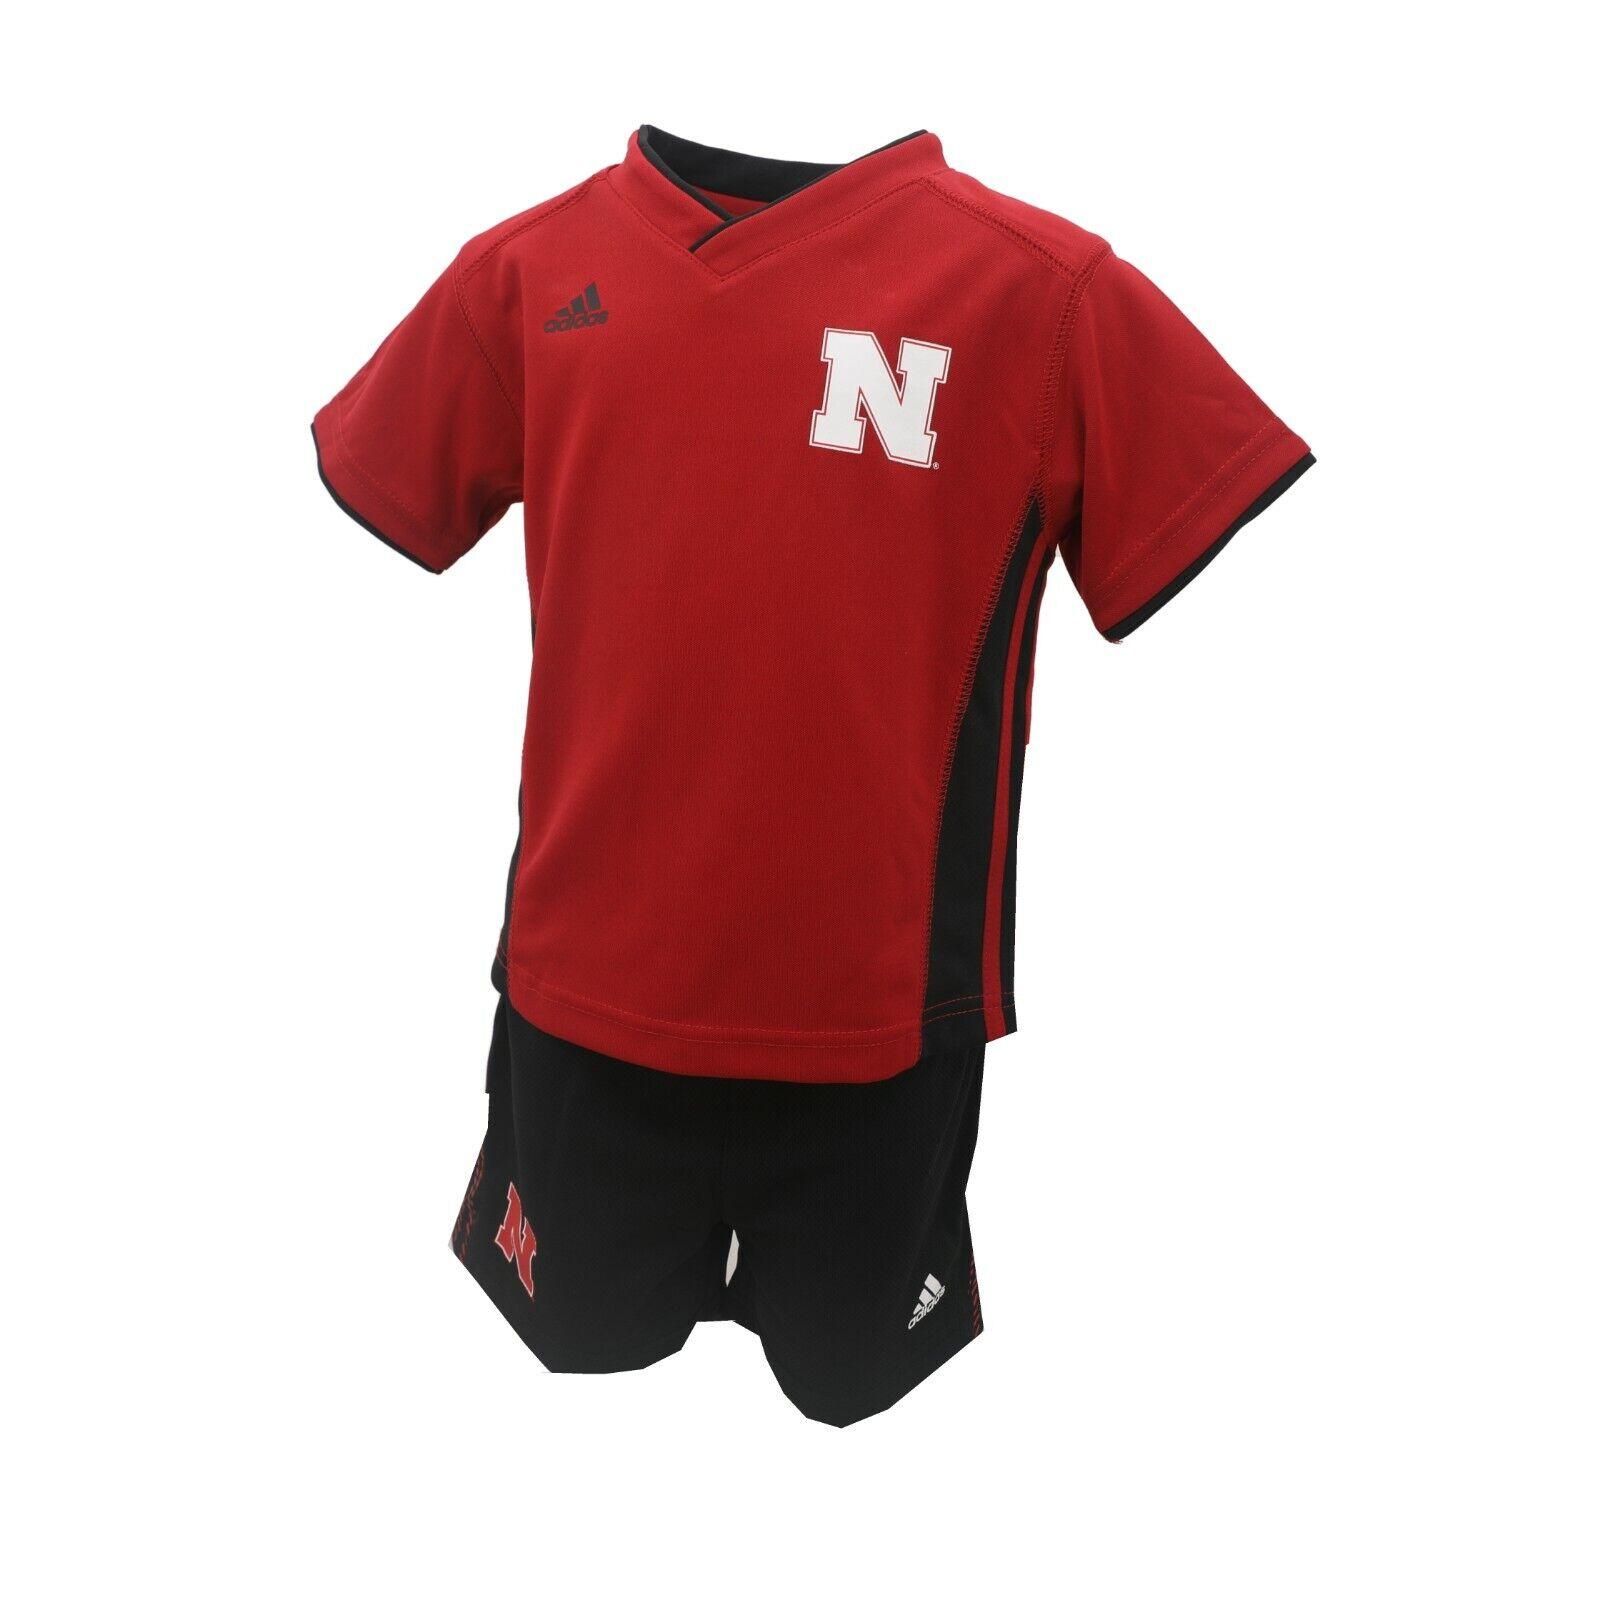 bdb00f62f Nebraska Cornhuskers NCAA Adidas Infant Size 2 Piece Shirt & Shorts Combo  Set